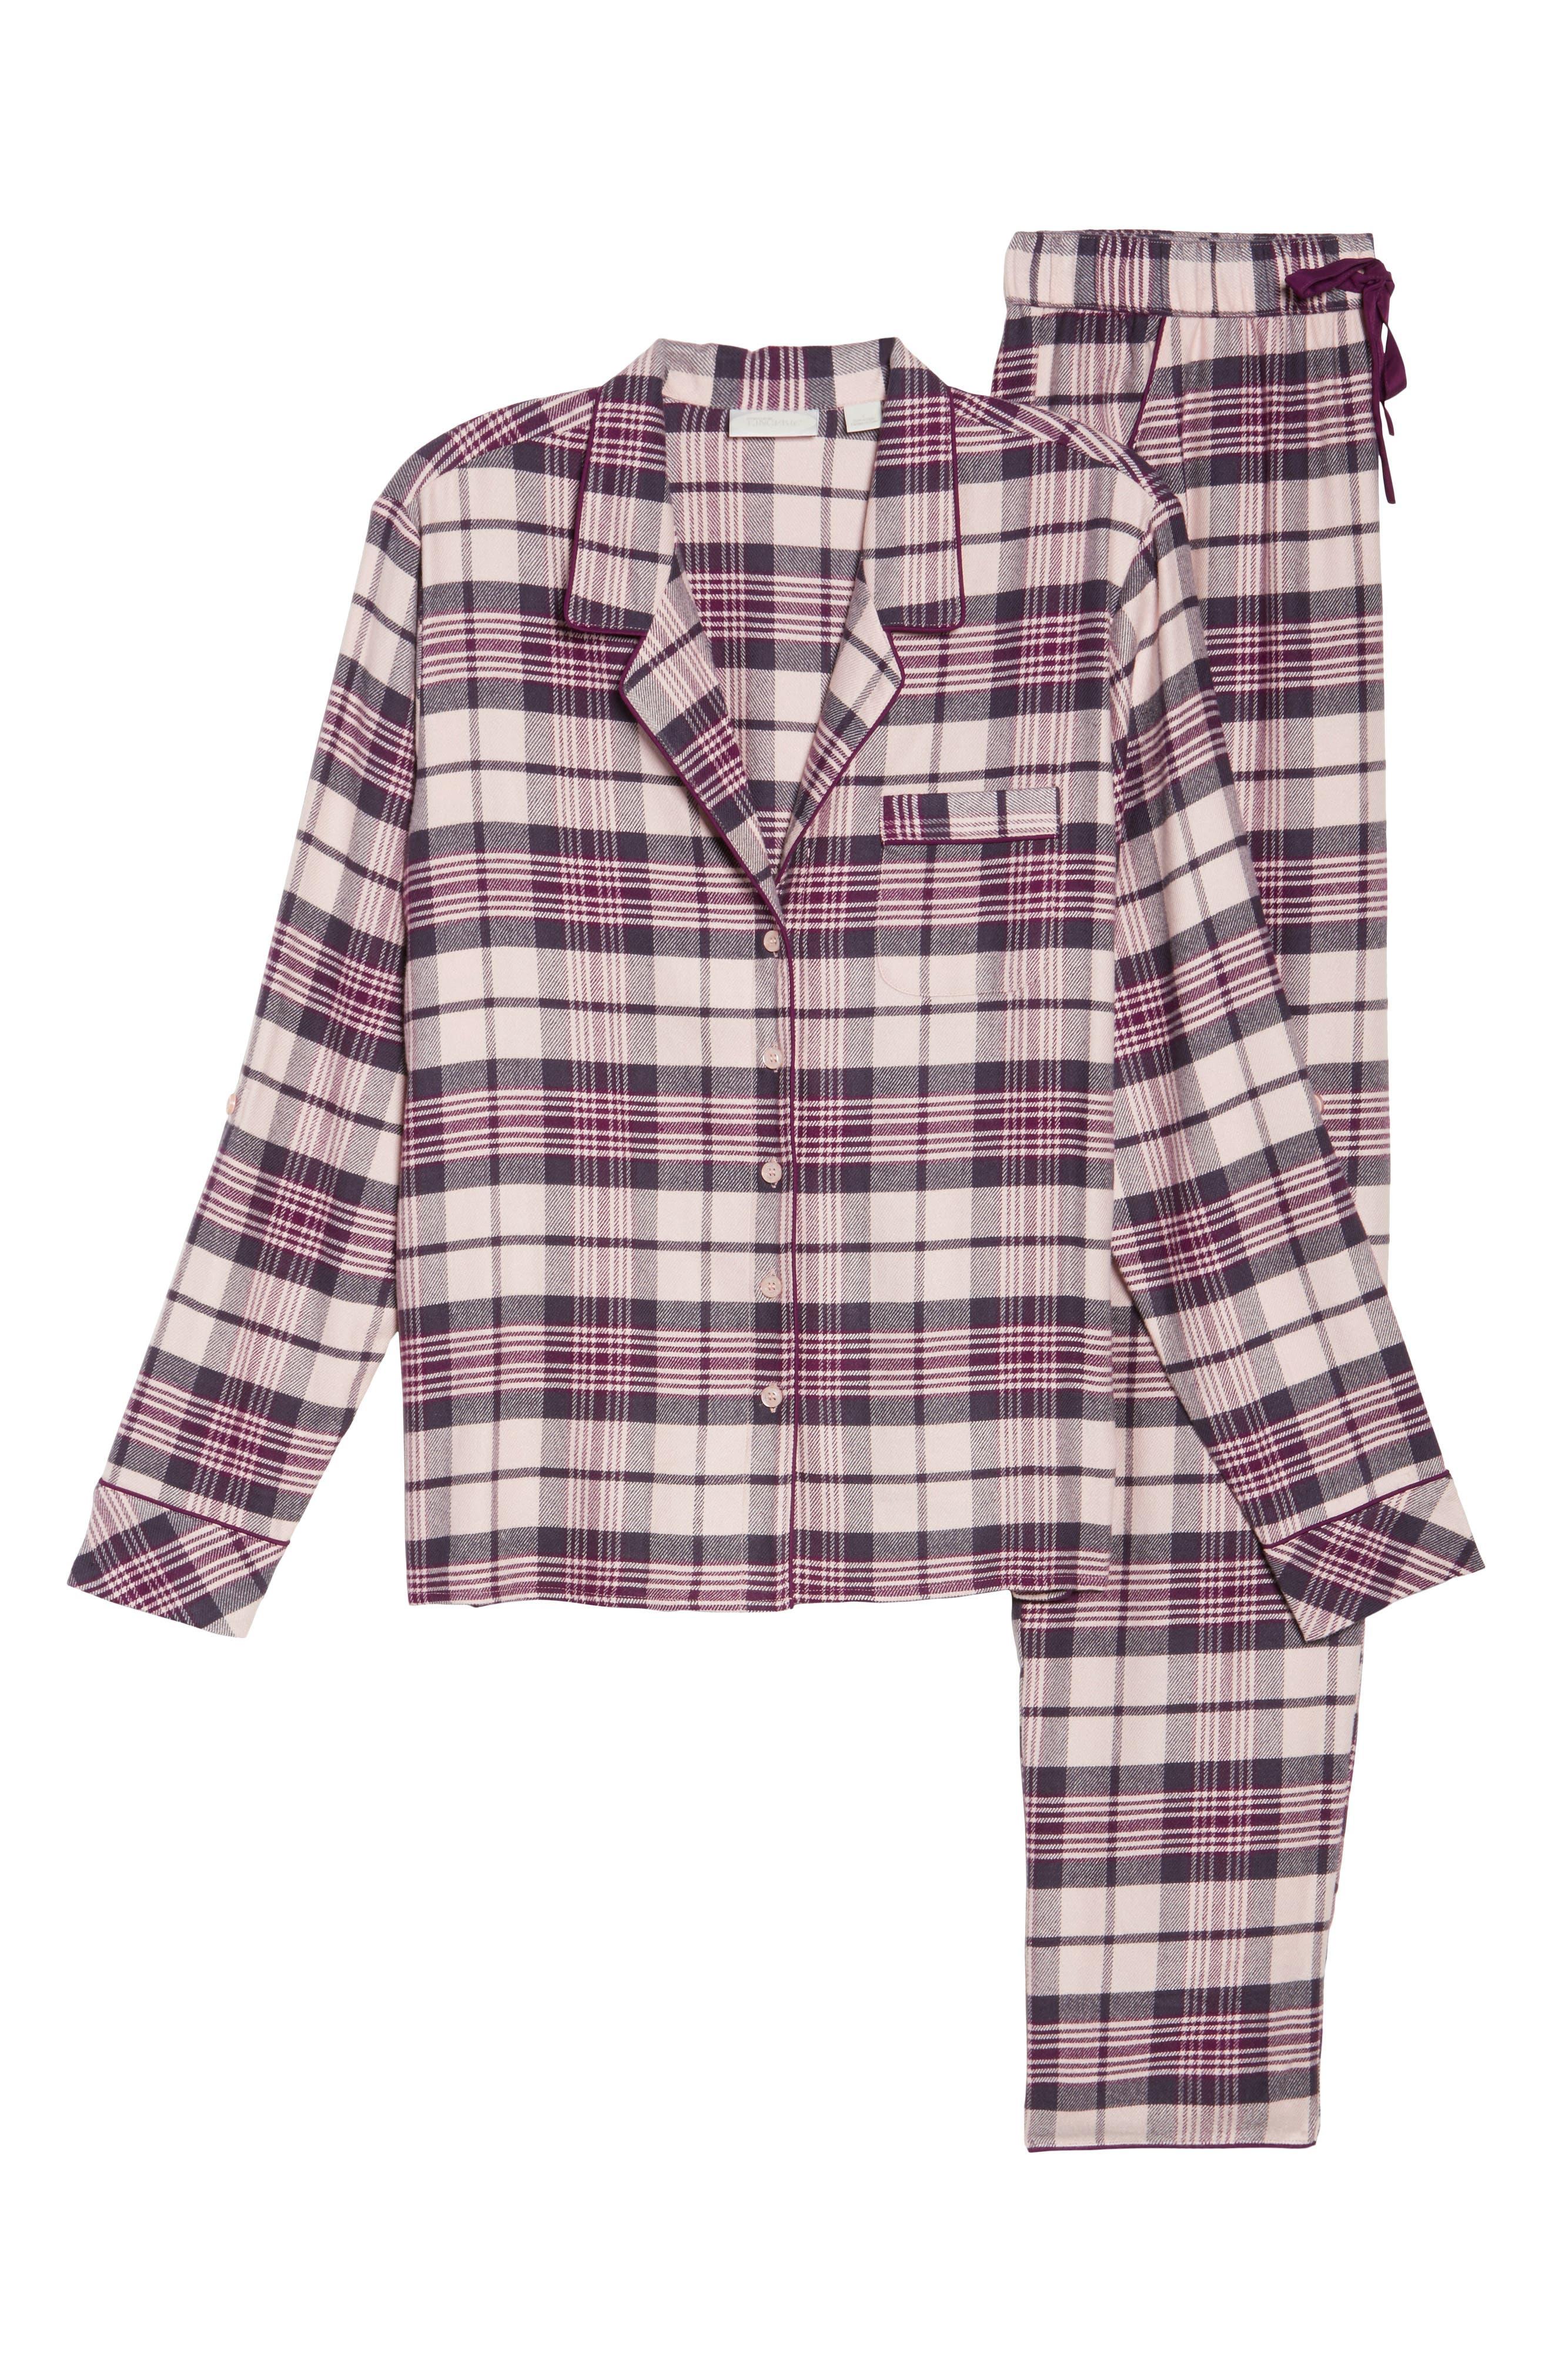 Lingerie Starlight Flannel Pajamas,                             Alternate thumbnail 6, color,                             Pink Peony Bud Tonal Tartan